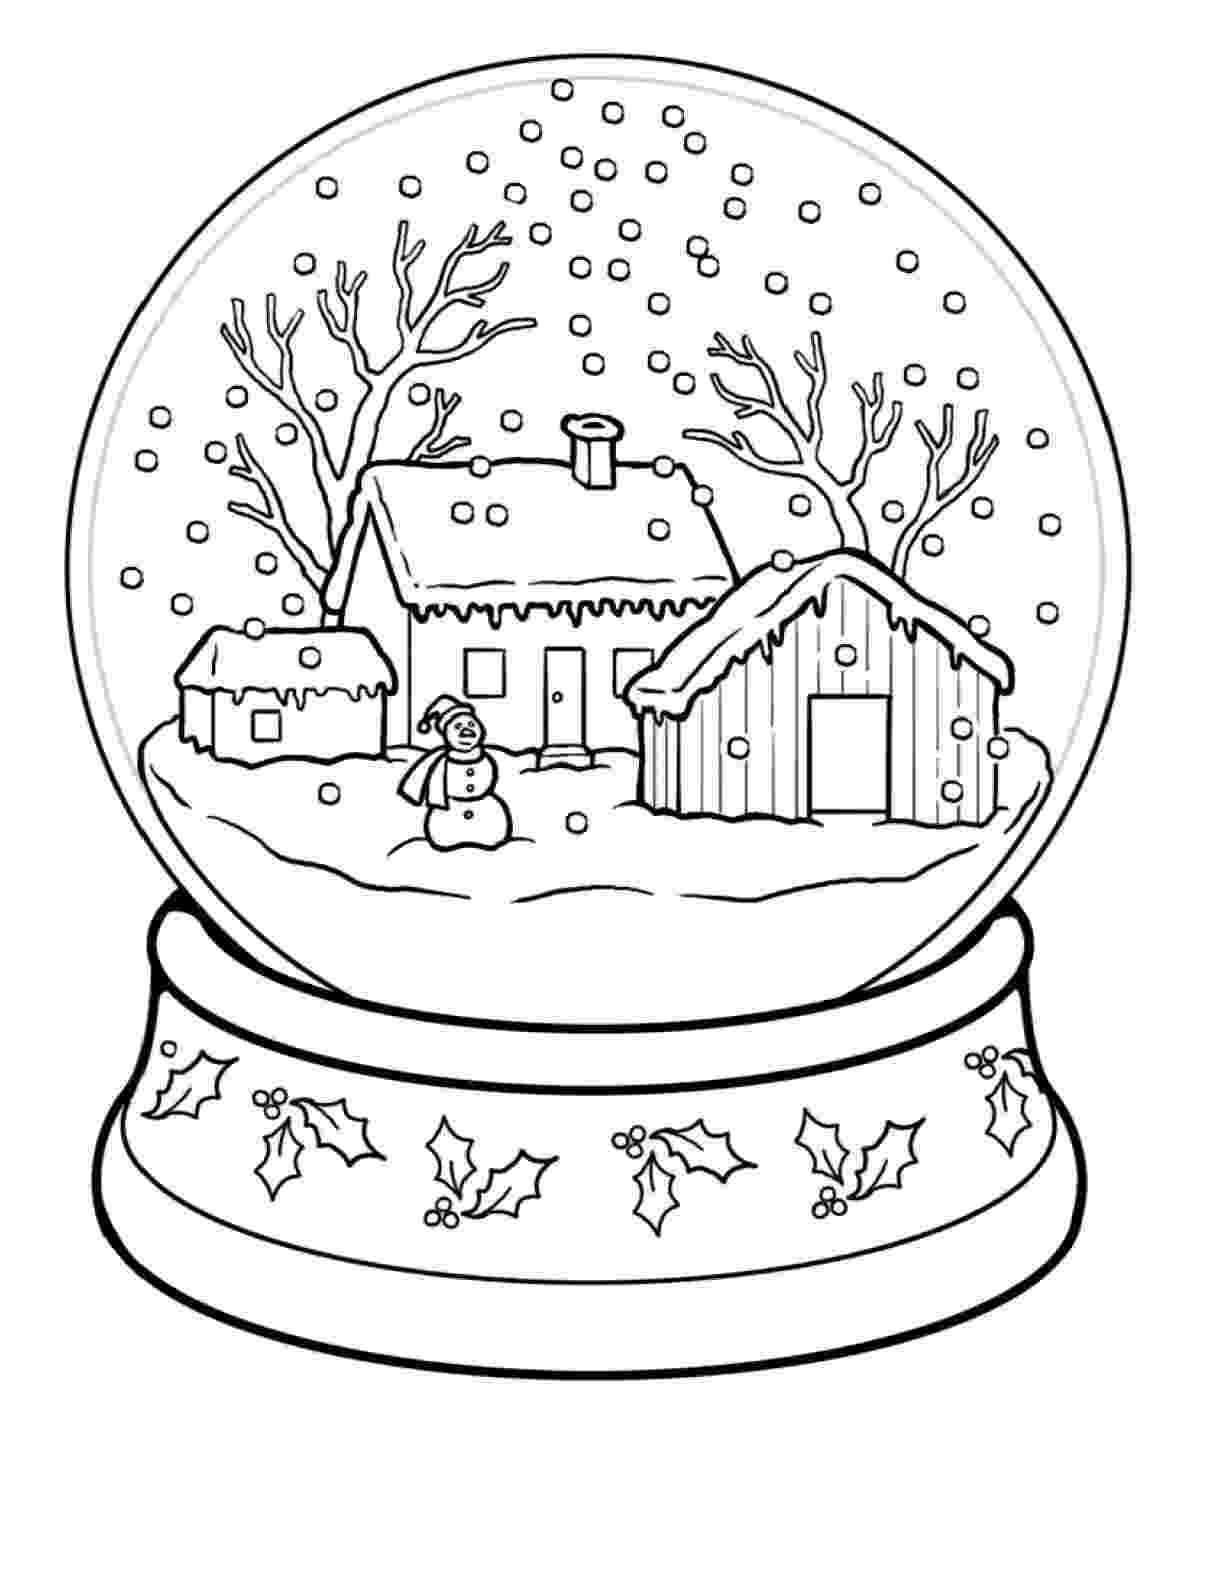 winter coloring sheets wonderful winter coloring page crayolacom winter sheets coloring